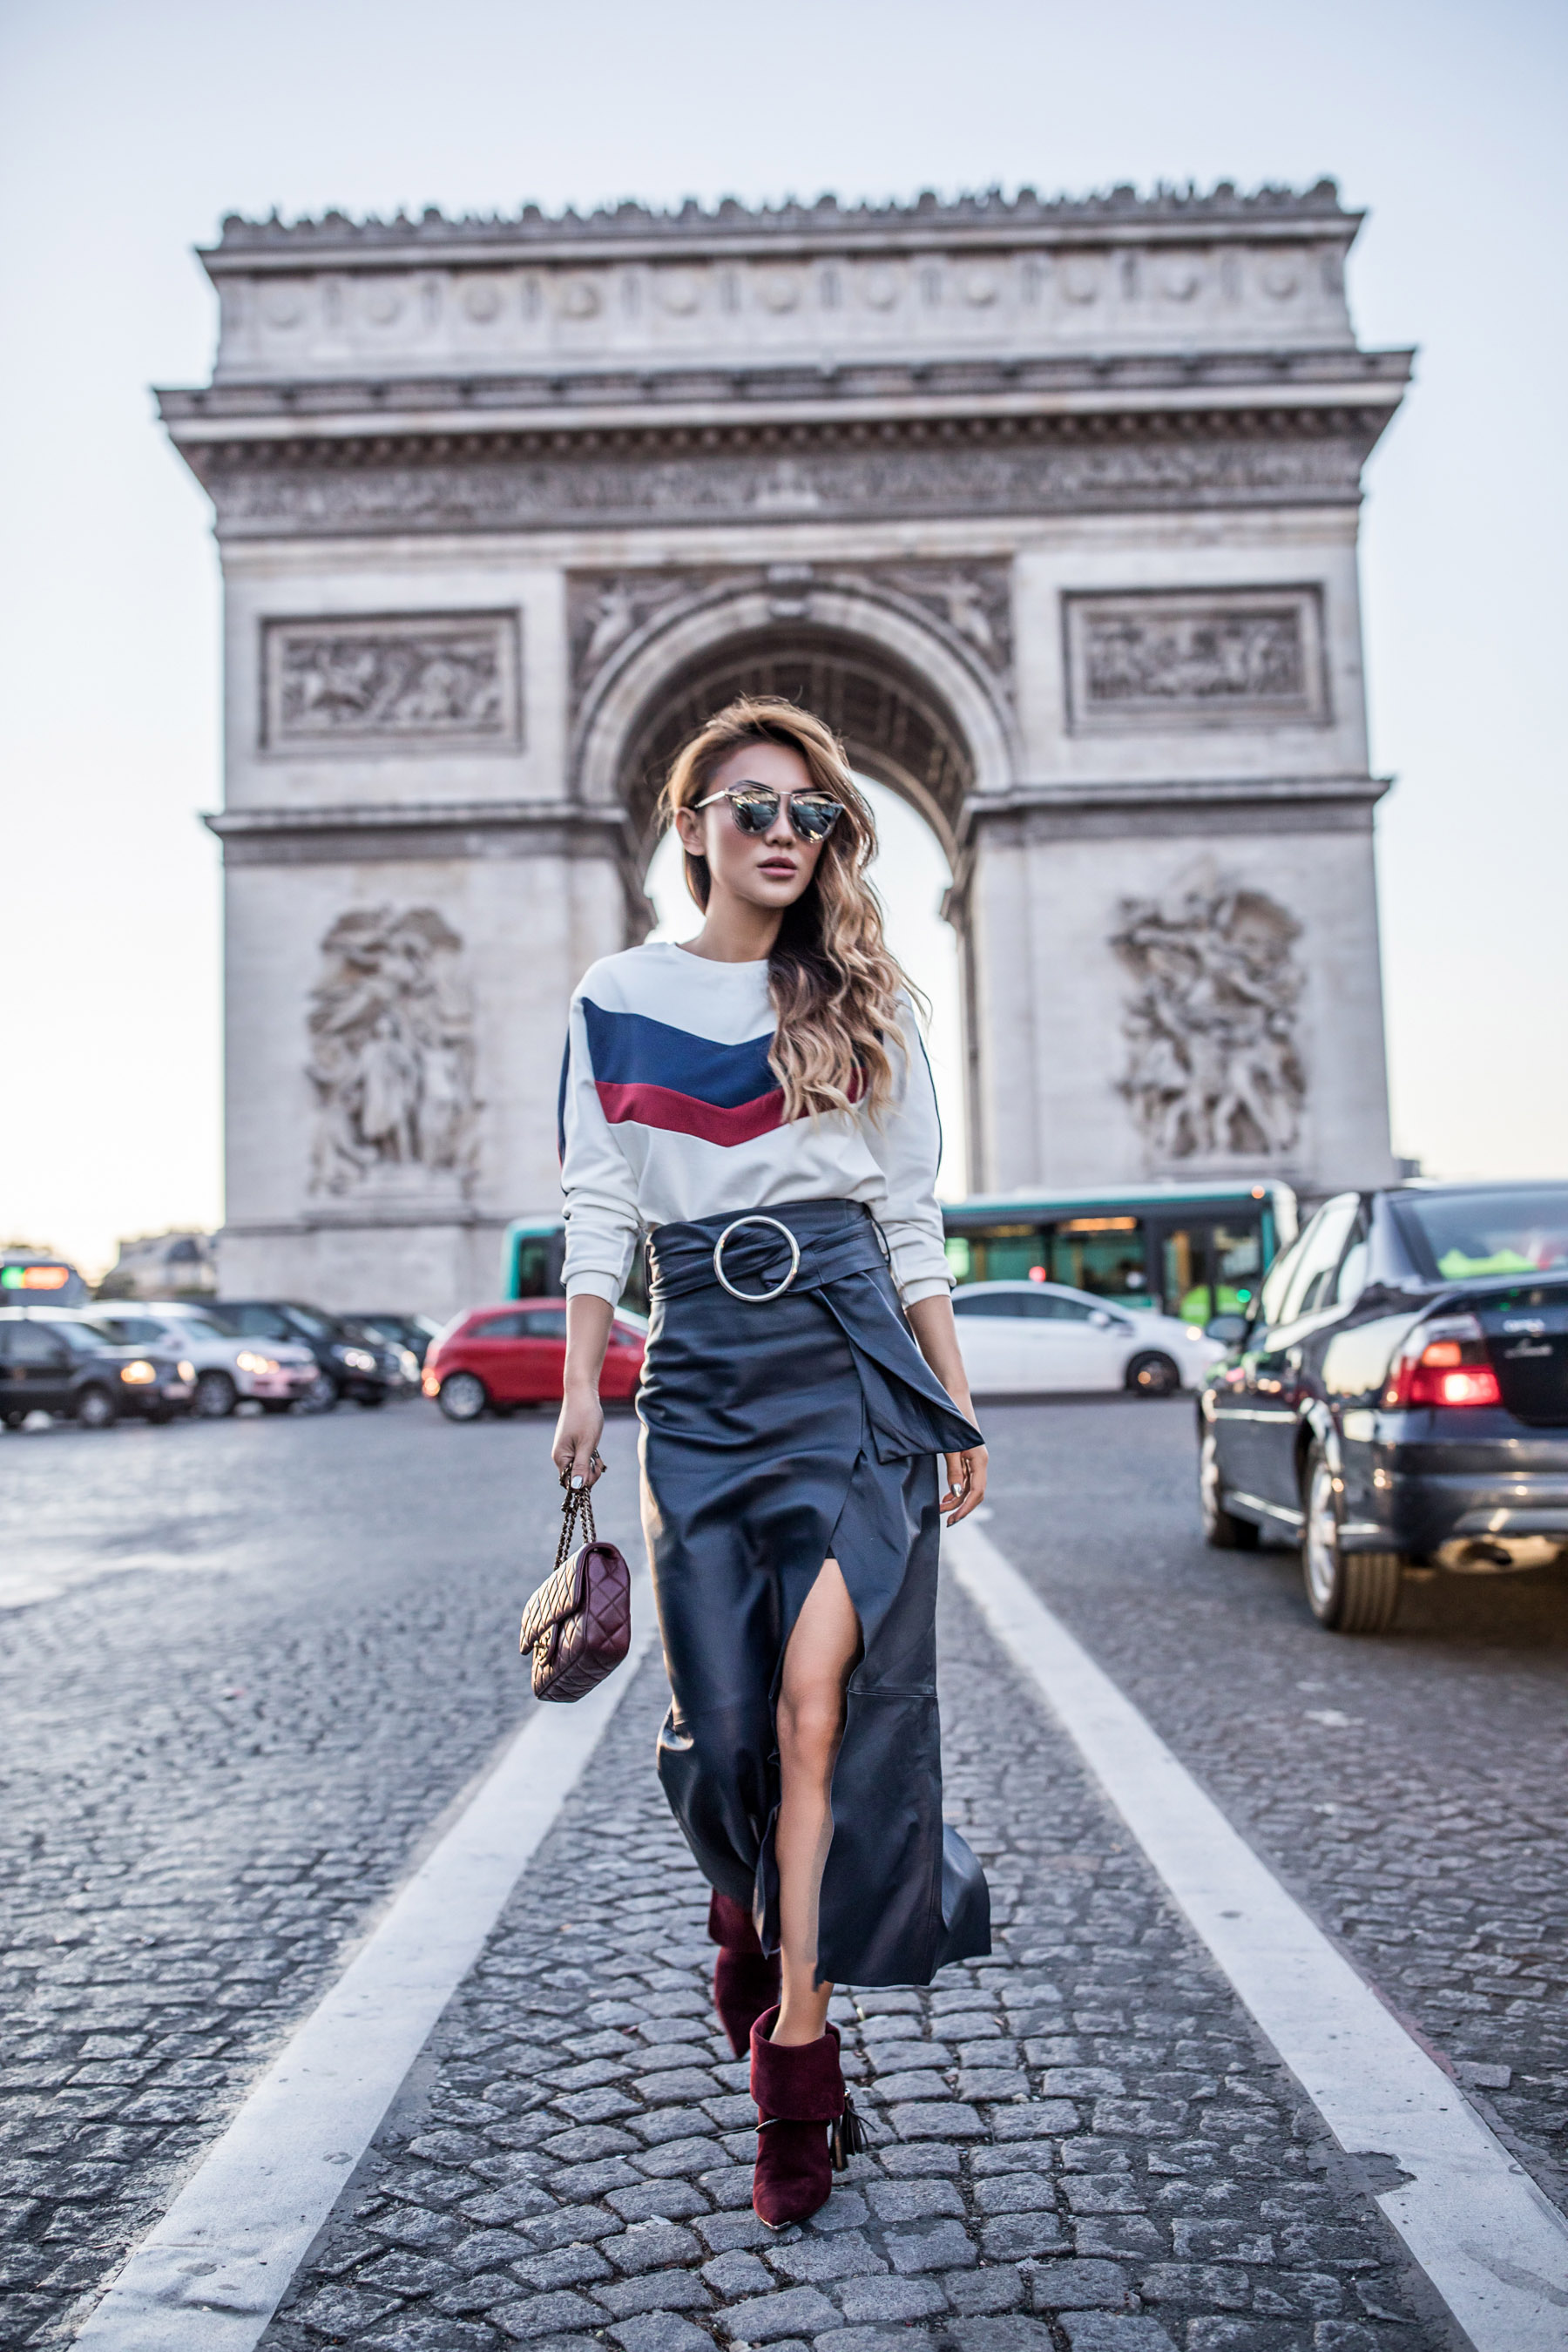 High-waisted leather max skirt // NotJessFashion.com